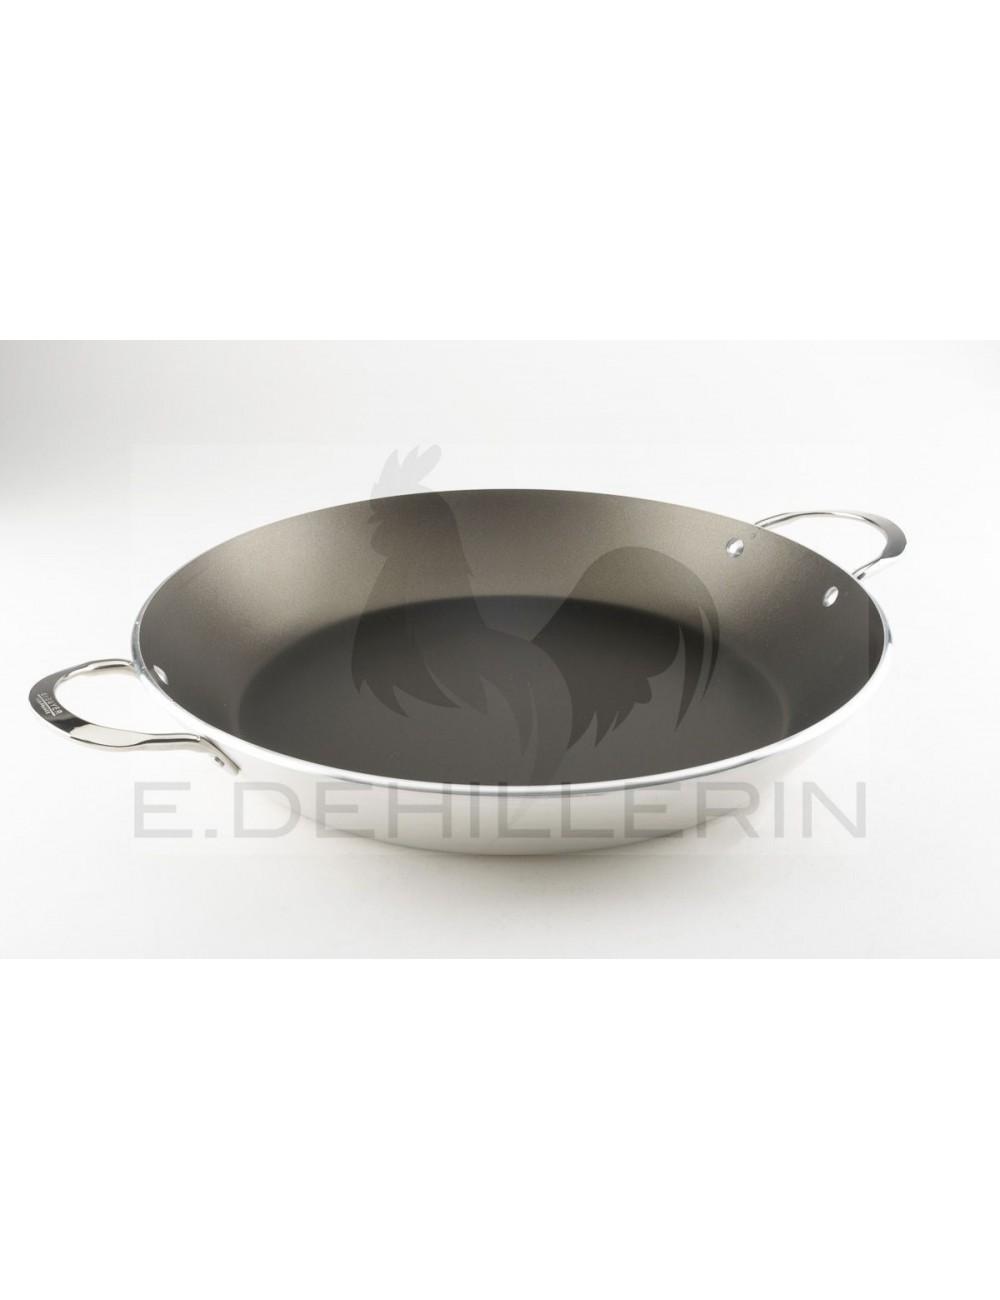 plat paella a anses choc d40 materiel de cuisson. Black Bedroom Furniture Sets. Home Design Ideas